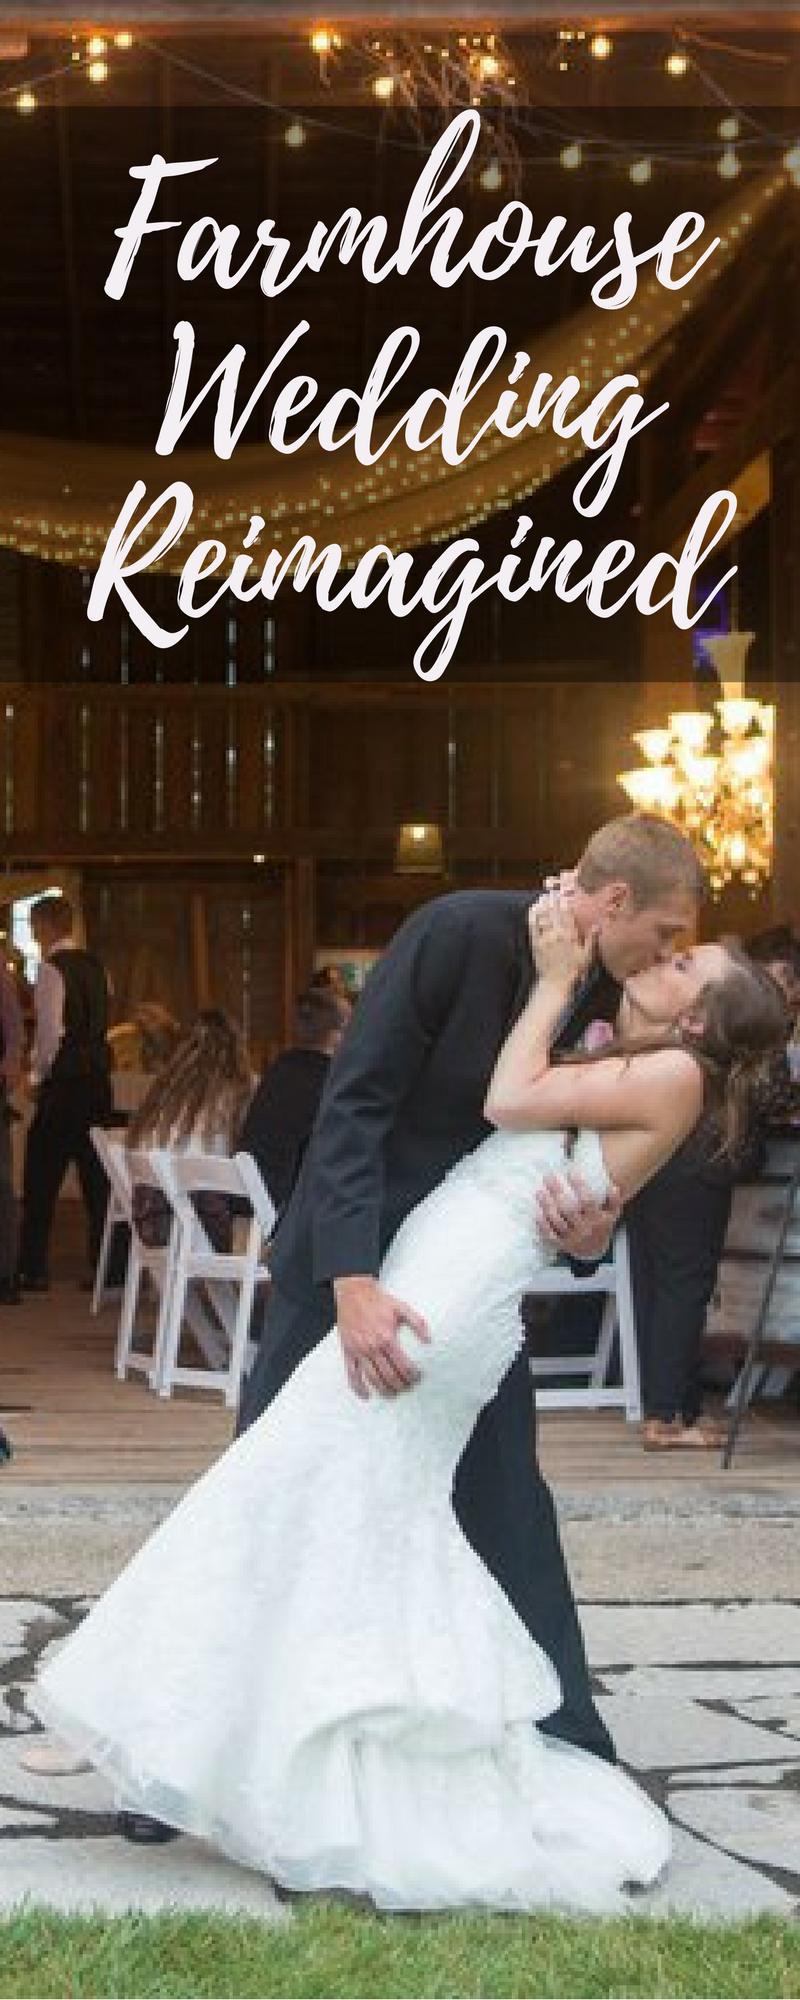 Wedding decoration png images  Farmhouse Wedding Reimagined   Bridal Companies u Wedding